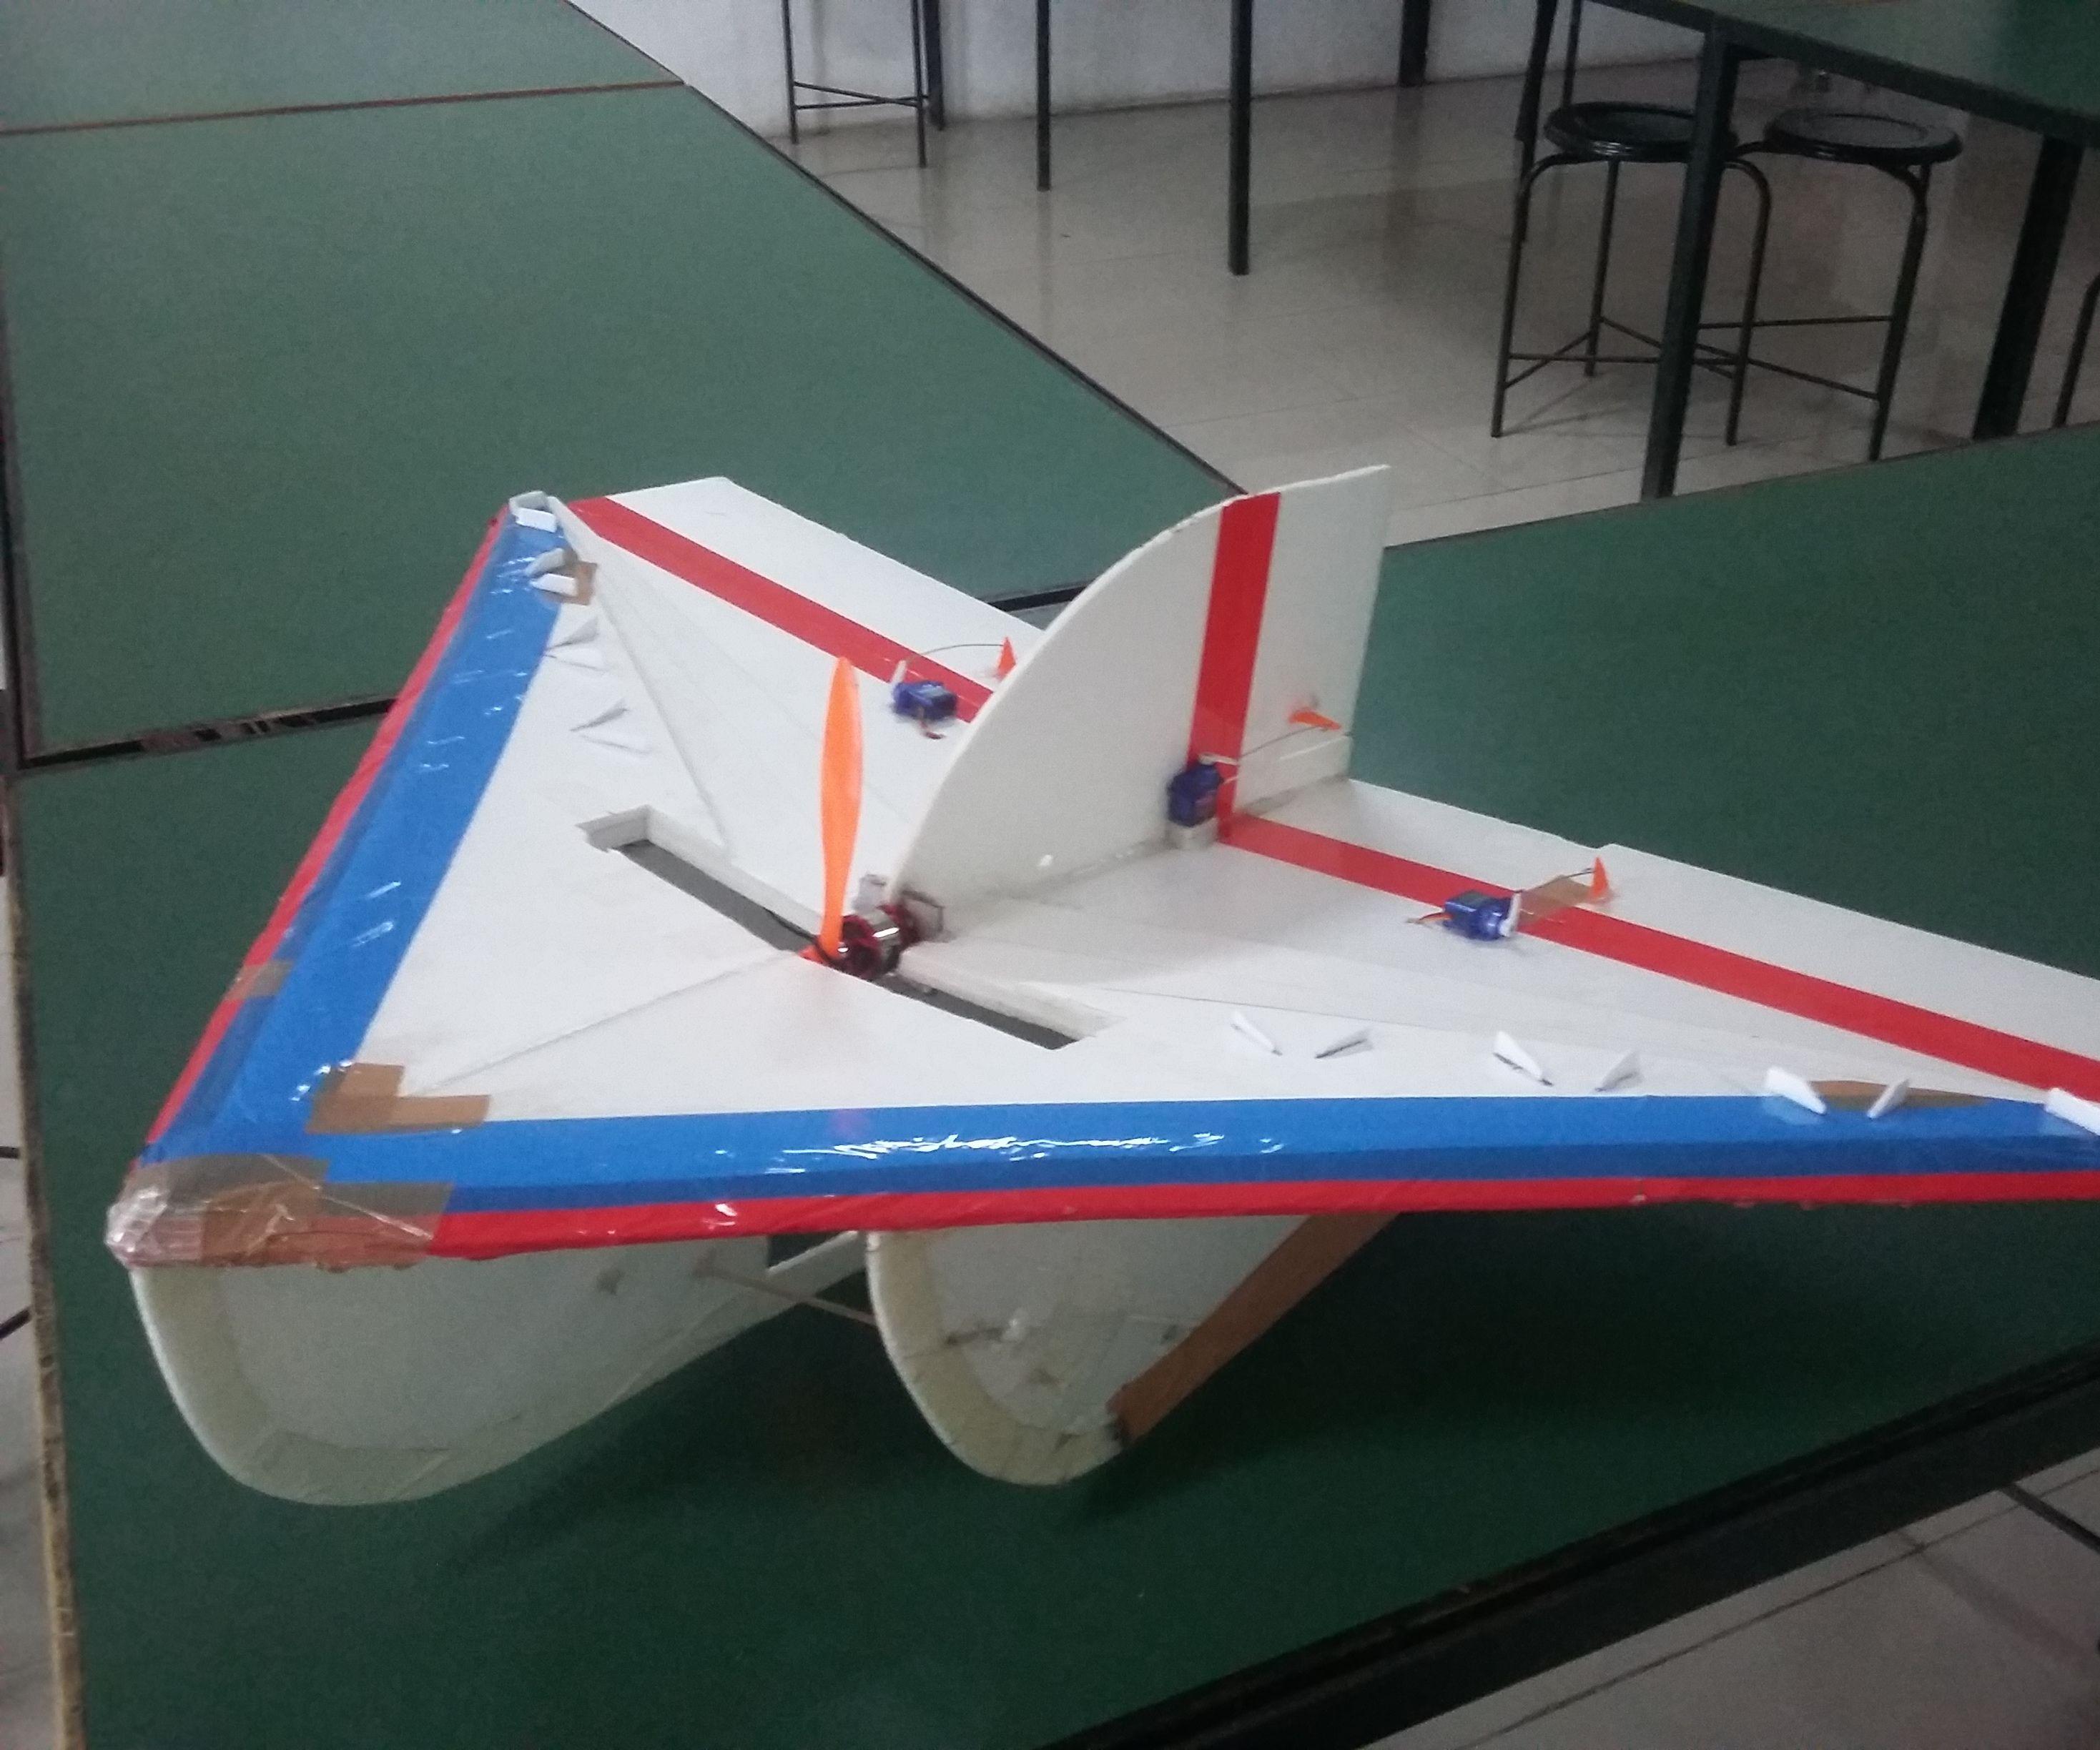 RC Delta Plane With Kfm3 Airfoil